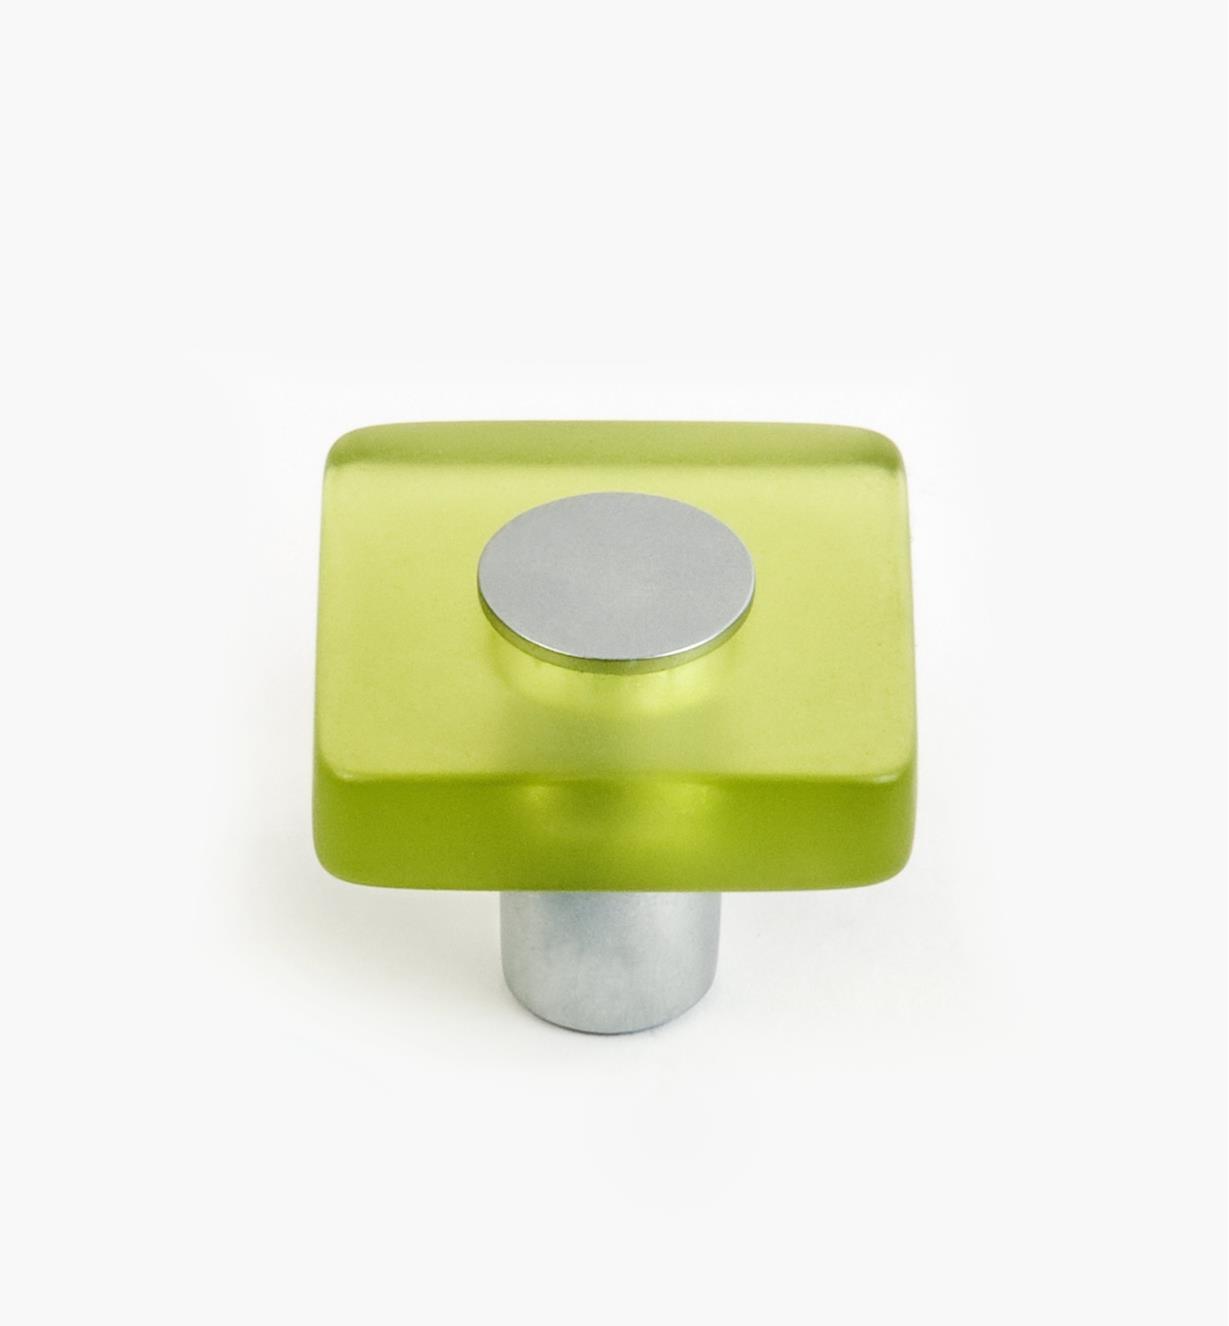 01W1150 - Malaga Hardware, Green Square Knob